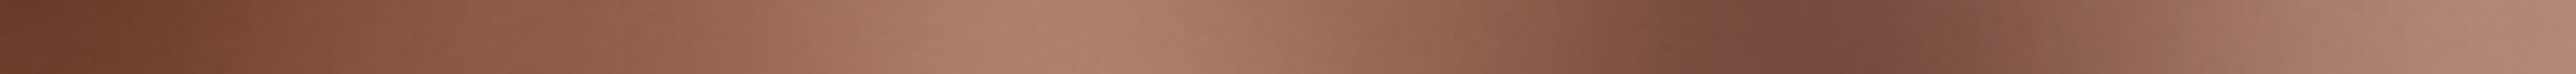 Бордюр Tubadzin Scarlet Copper 74.8x2.3